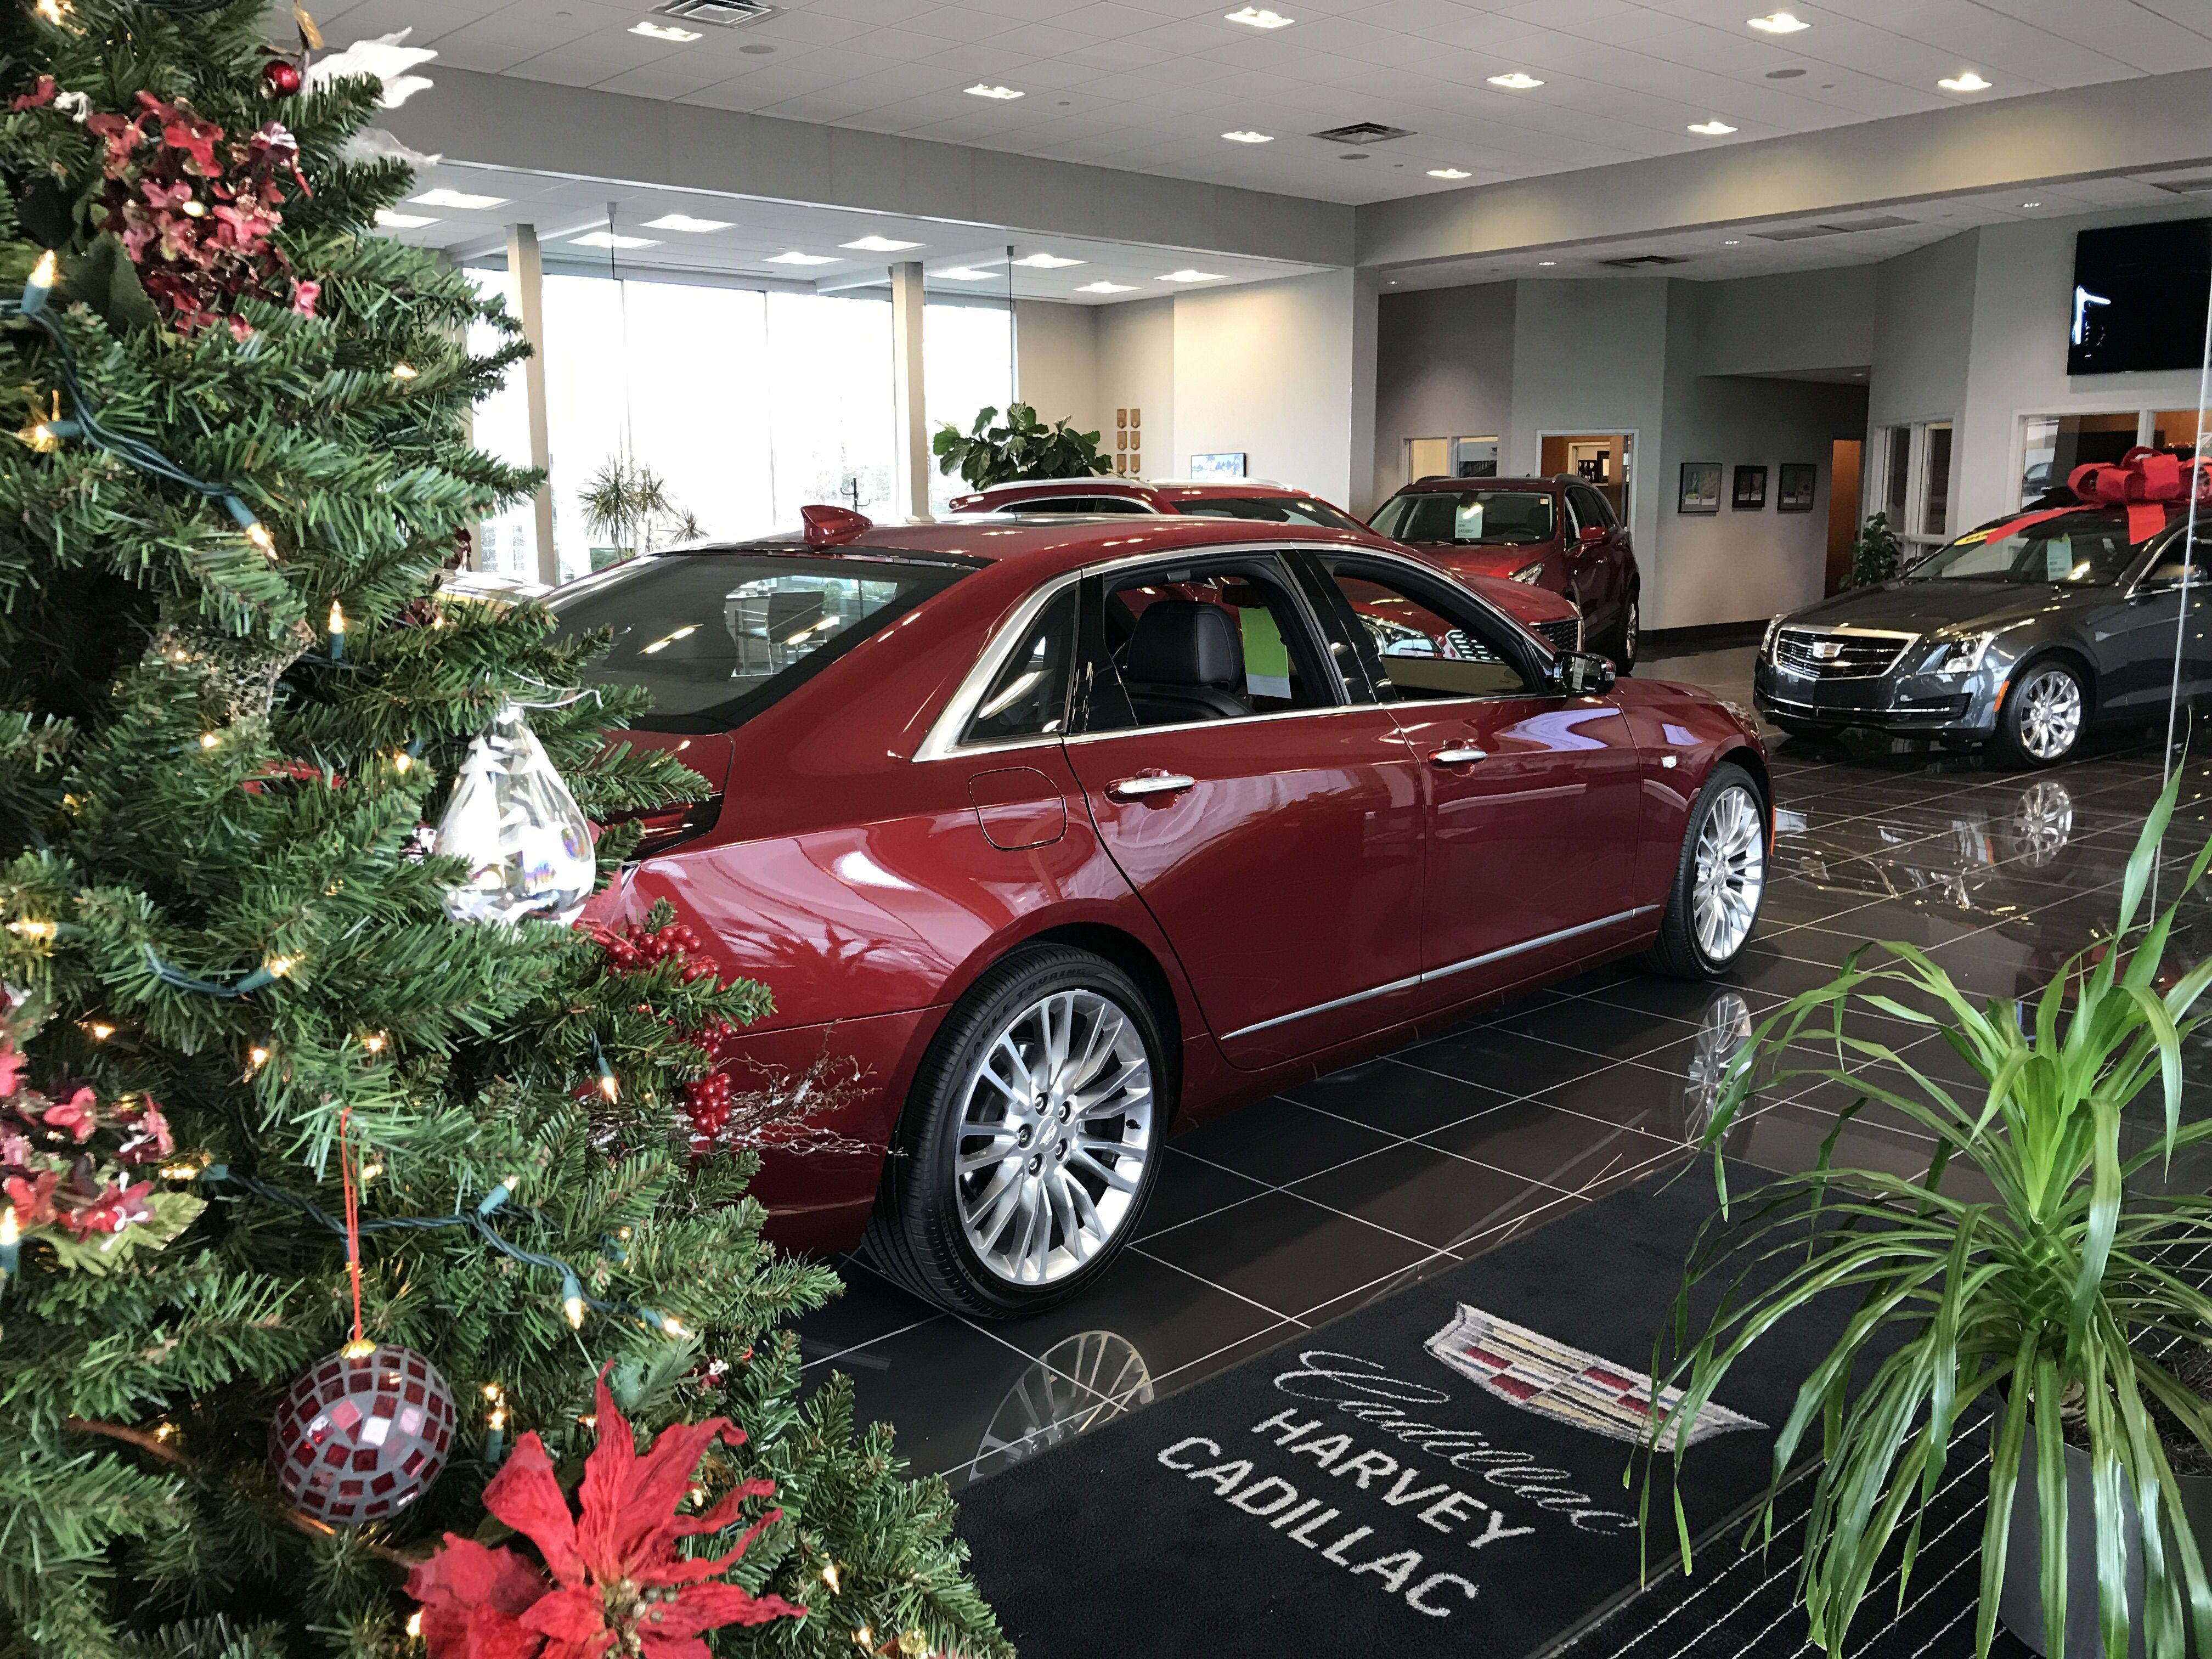 Craigslist Cars For Sale Northern Michigan